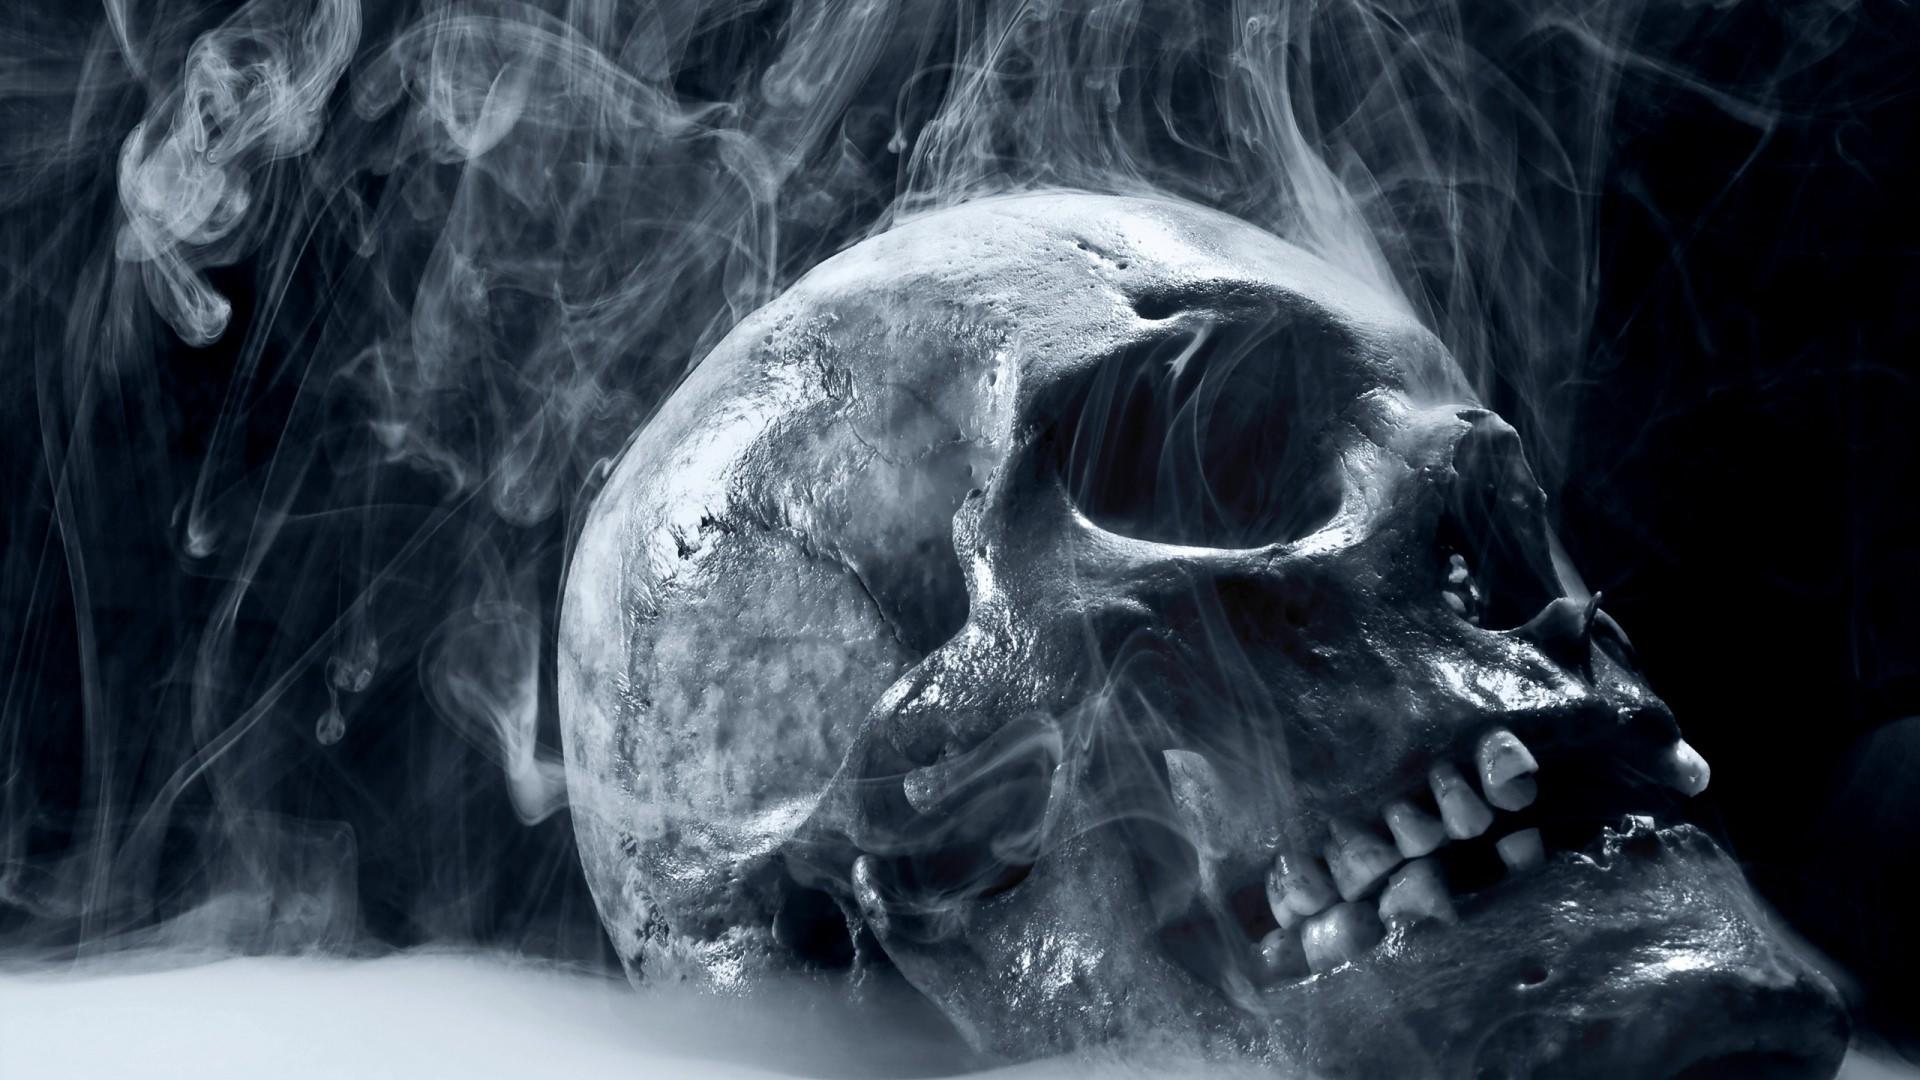 Smoke and Skull Scary Wallpaper